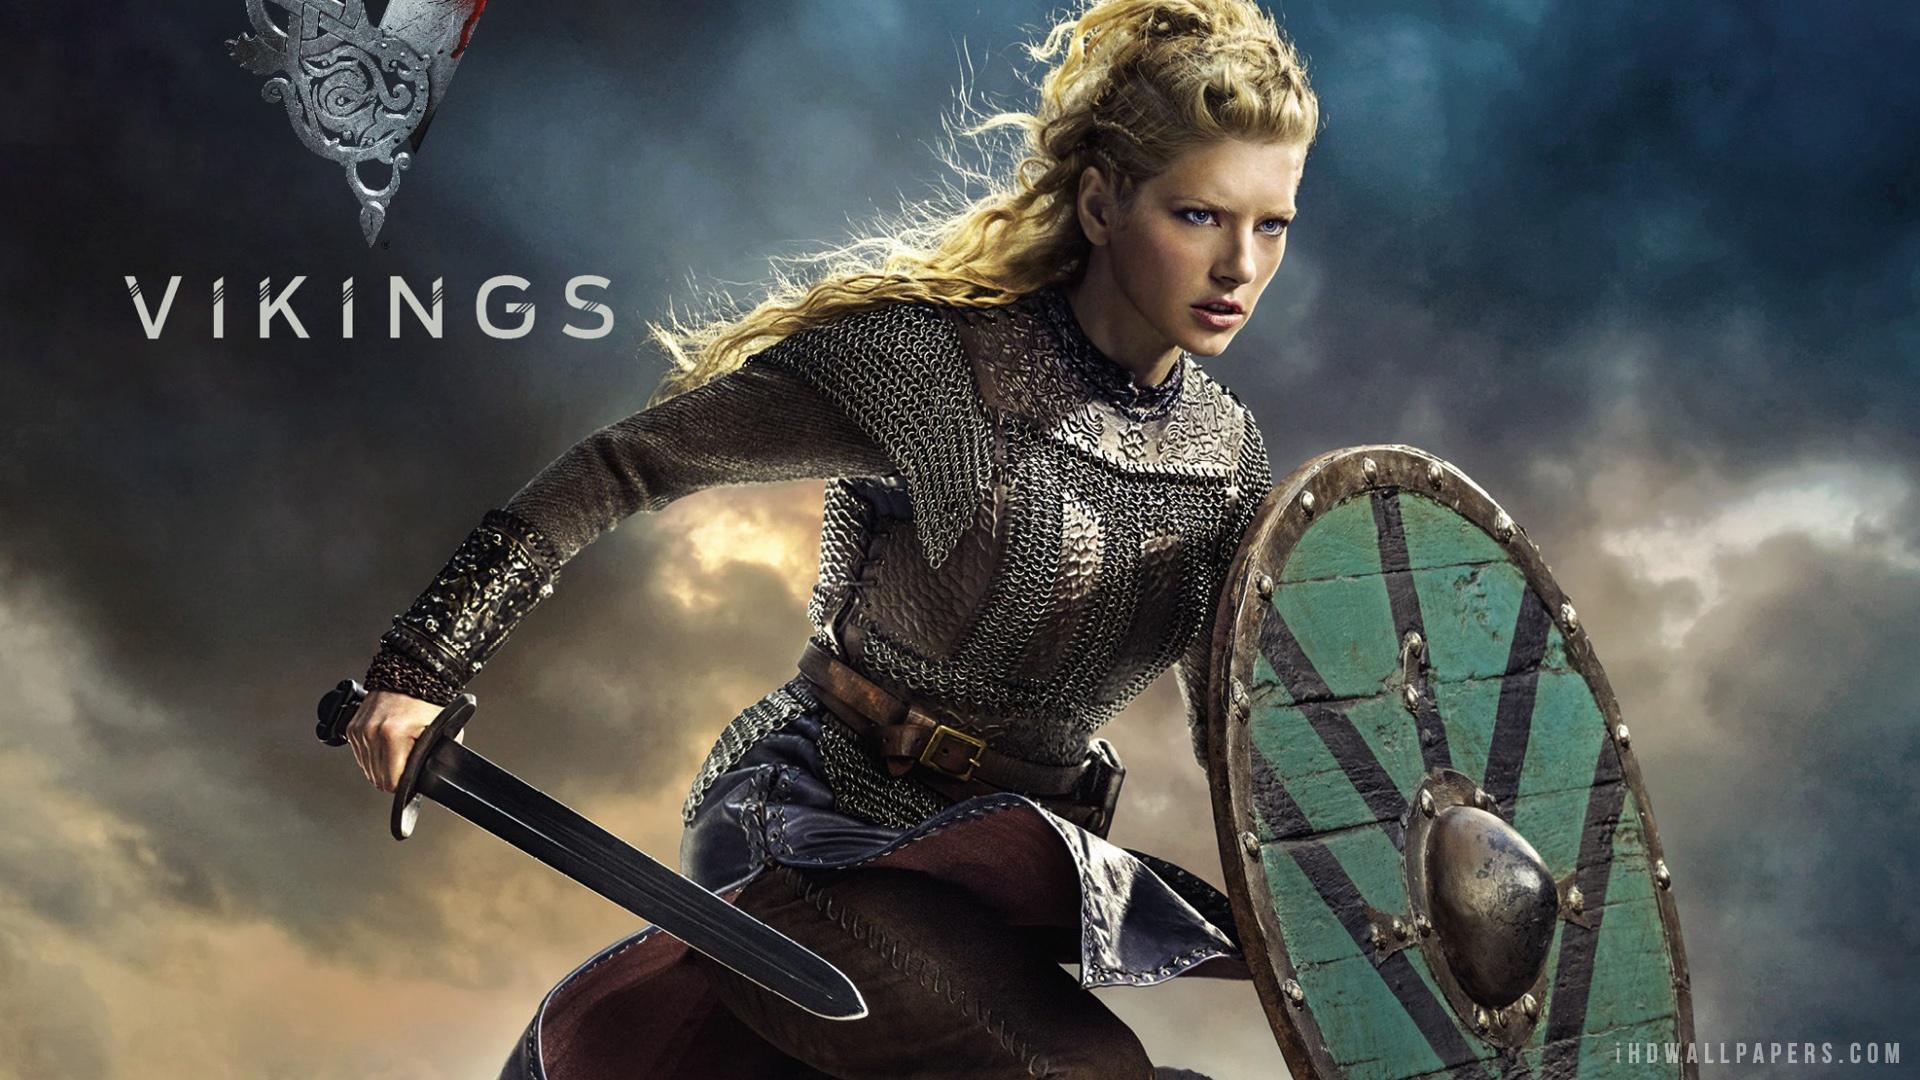 Winnick in Vikings Season 2 TV Series HD Wallpaper   iHD Wallpapers 1920x1080